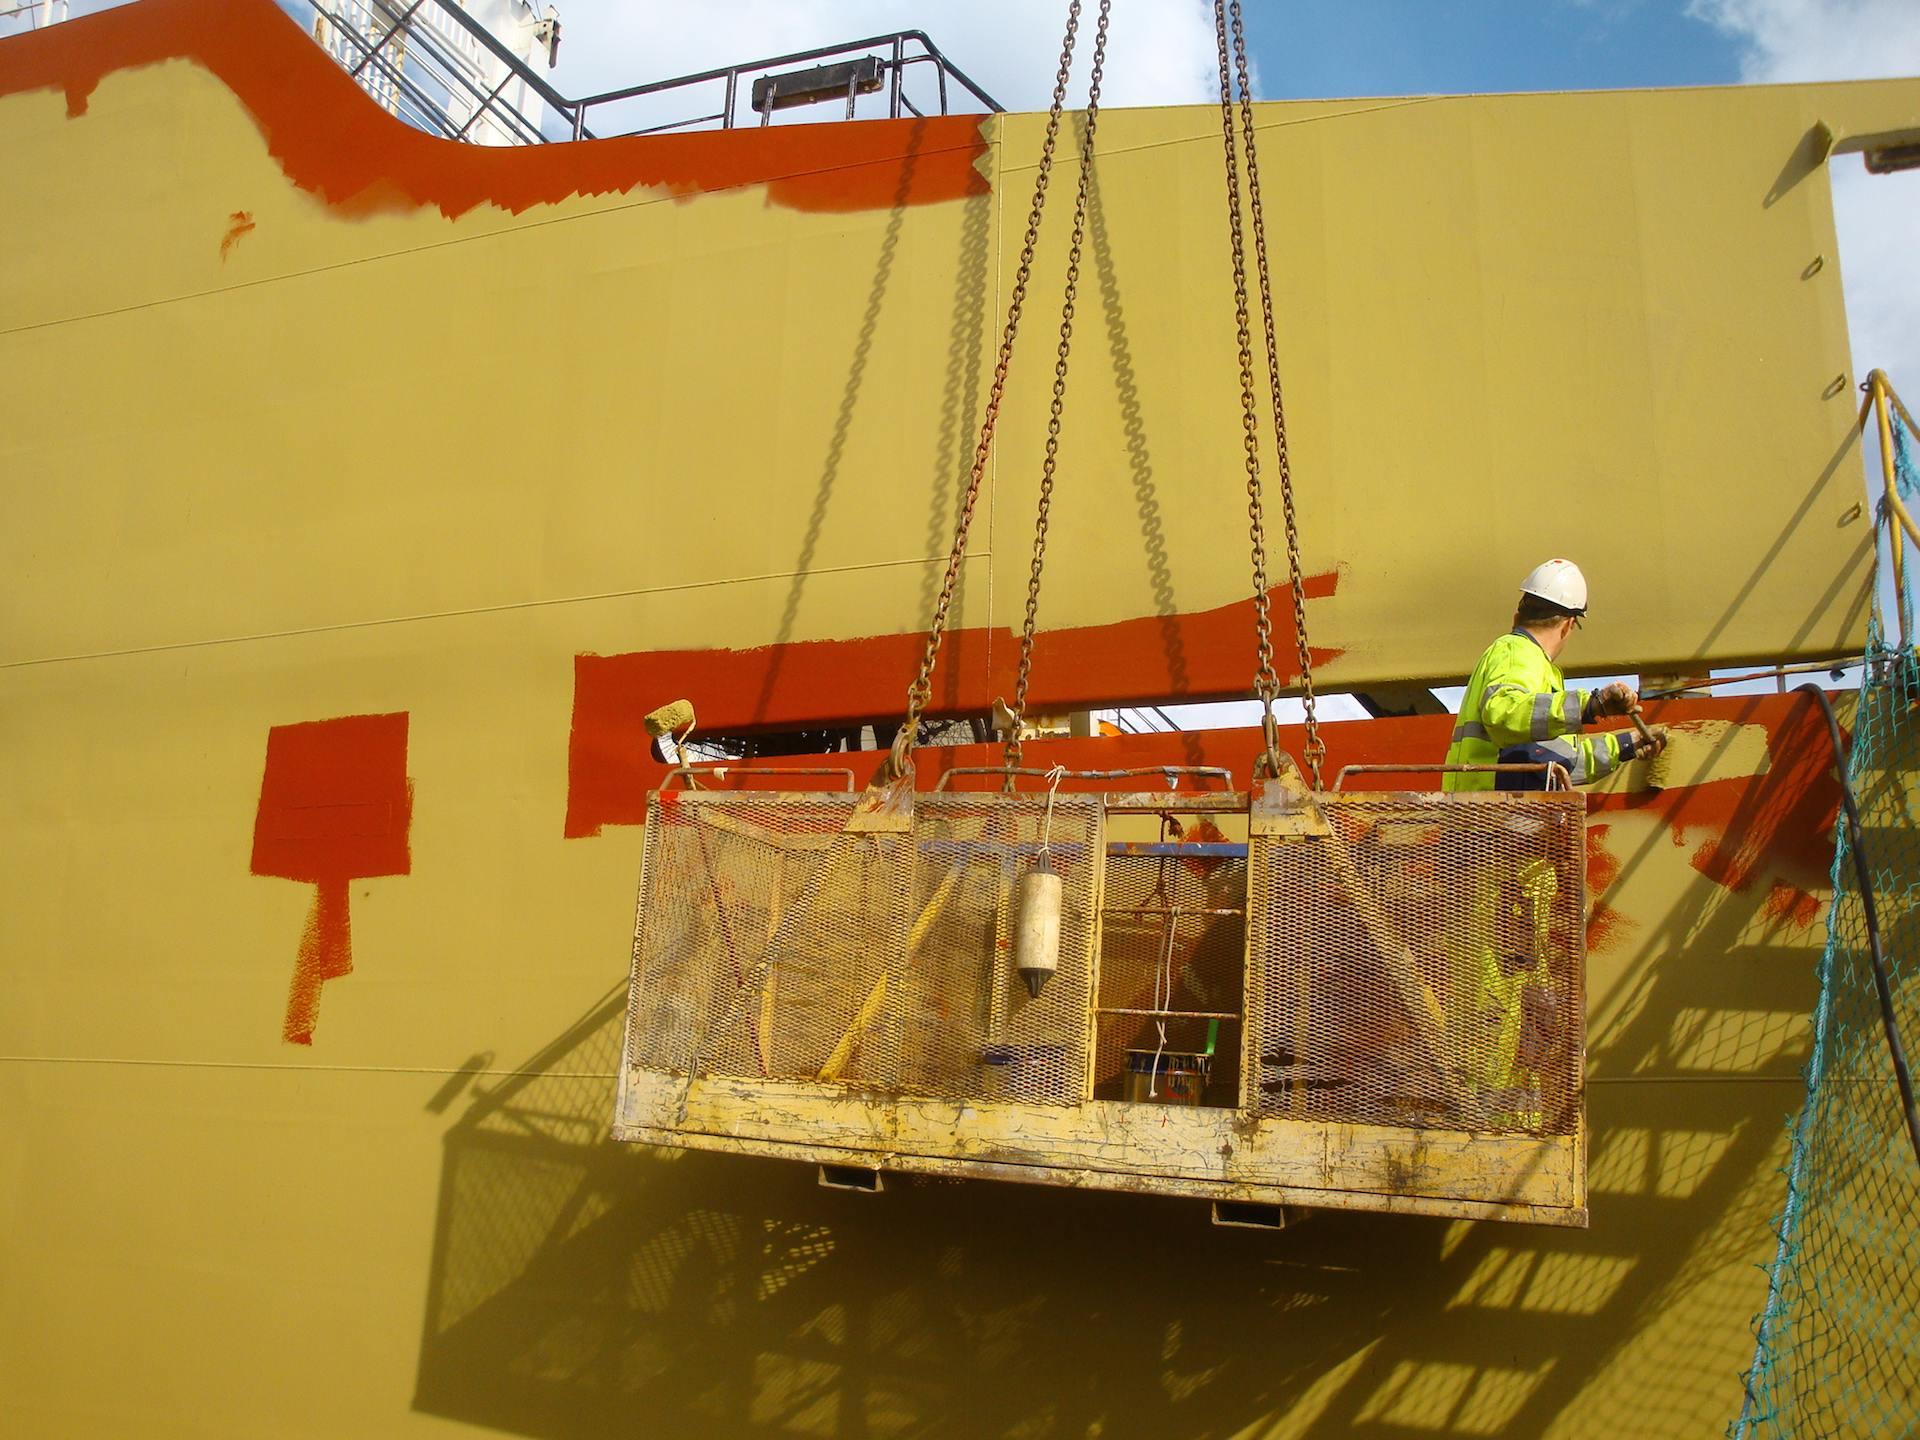 The maximum docking capacity is at maximum dwt 10 b7c35327f09a